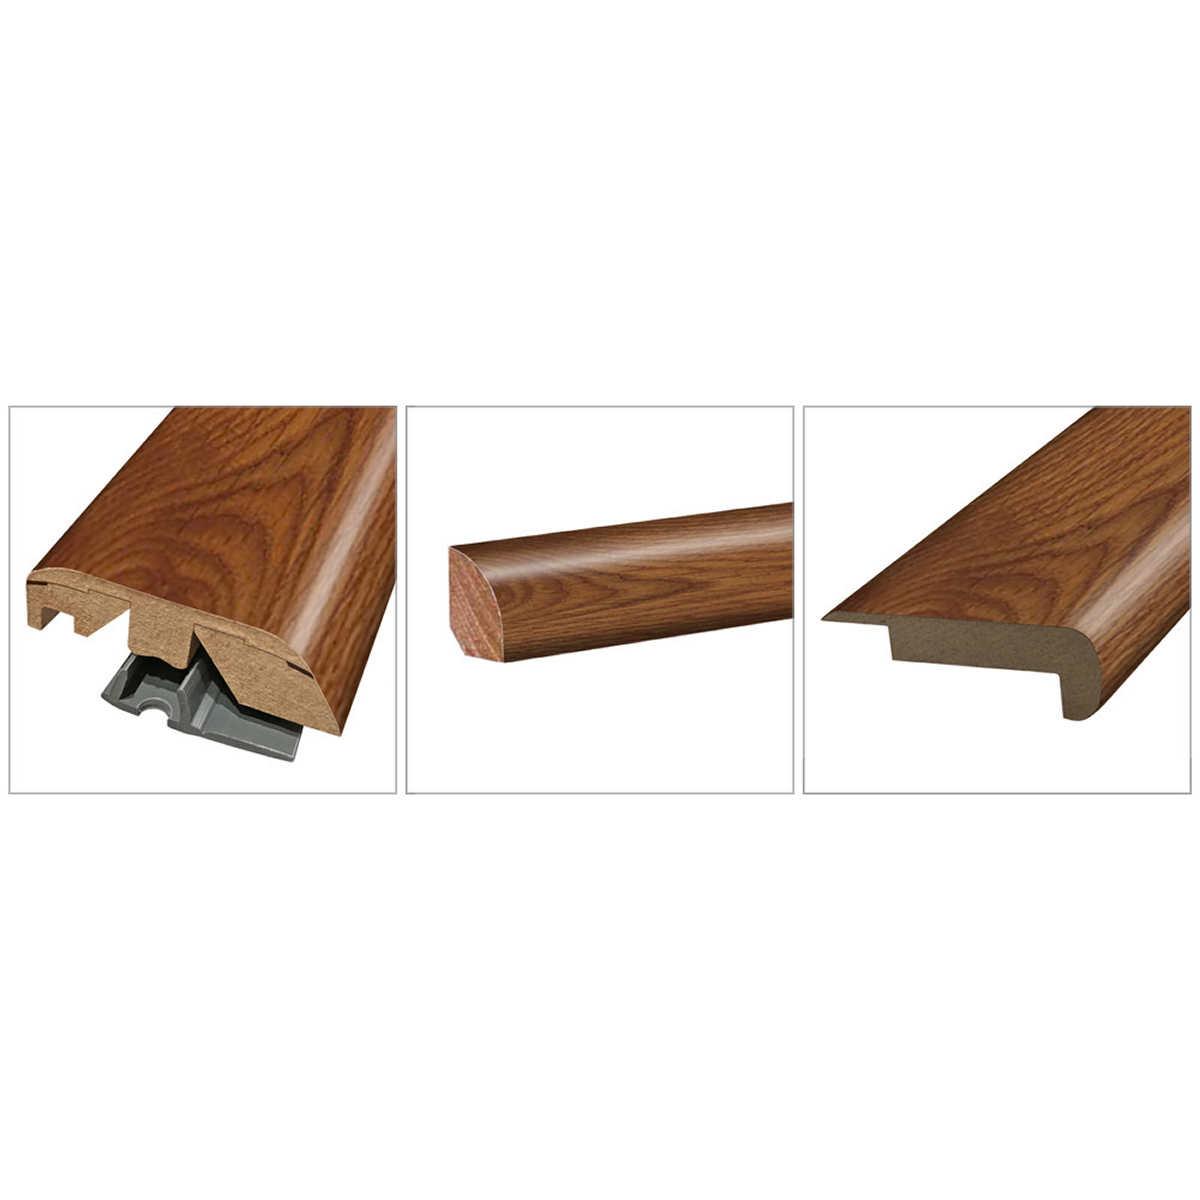 Mohawk Home Rustic Spiced Oak Laminate Flooring Accessory